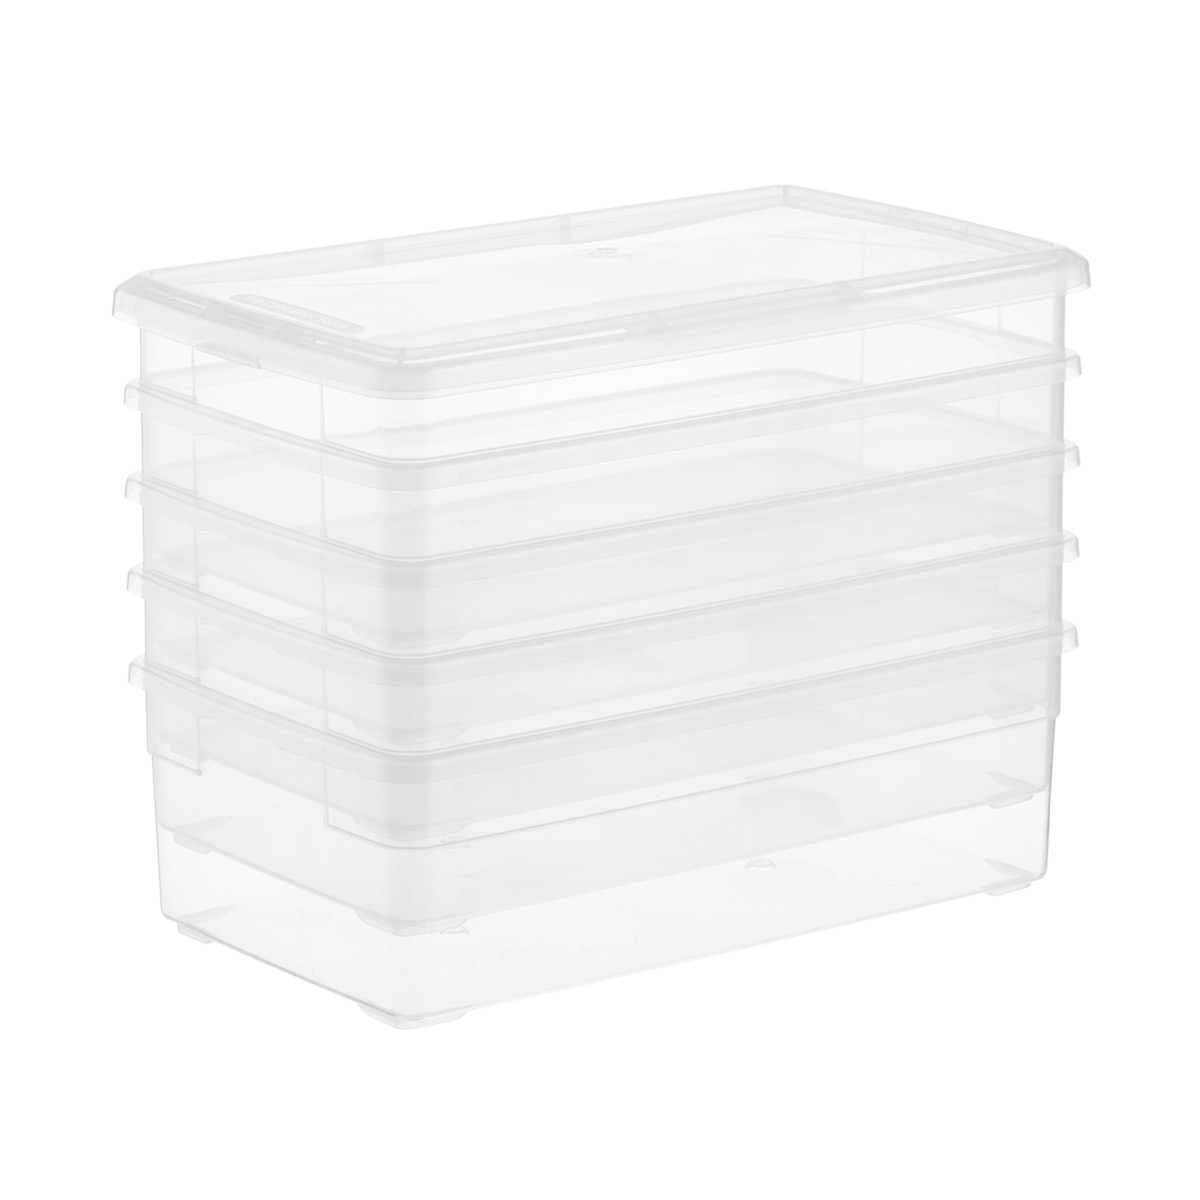 Blue 3 pcs SXYLOB Plastic Pull Shoe Storage Box Clear Stackable Shoes Boxes Cabinet Organizer Flip Drawer